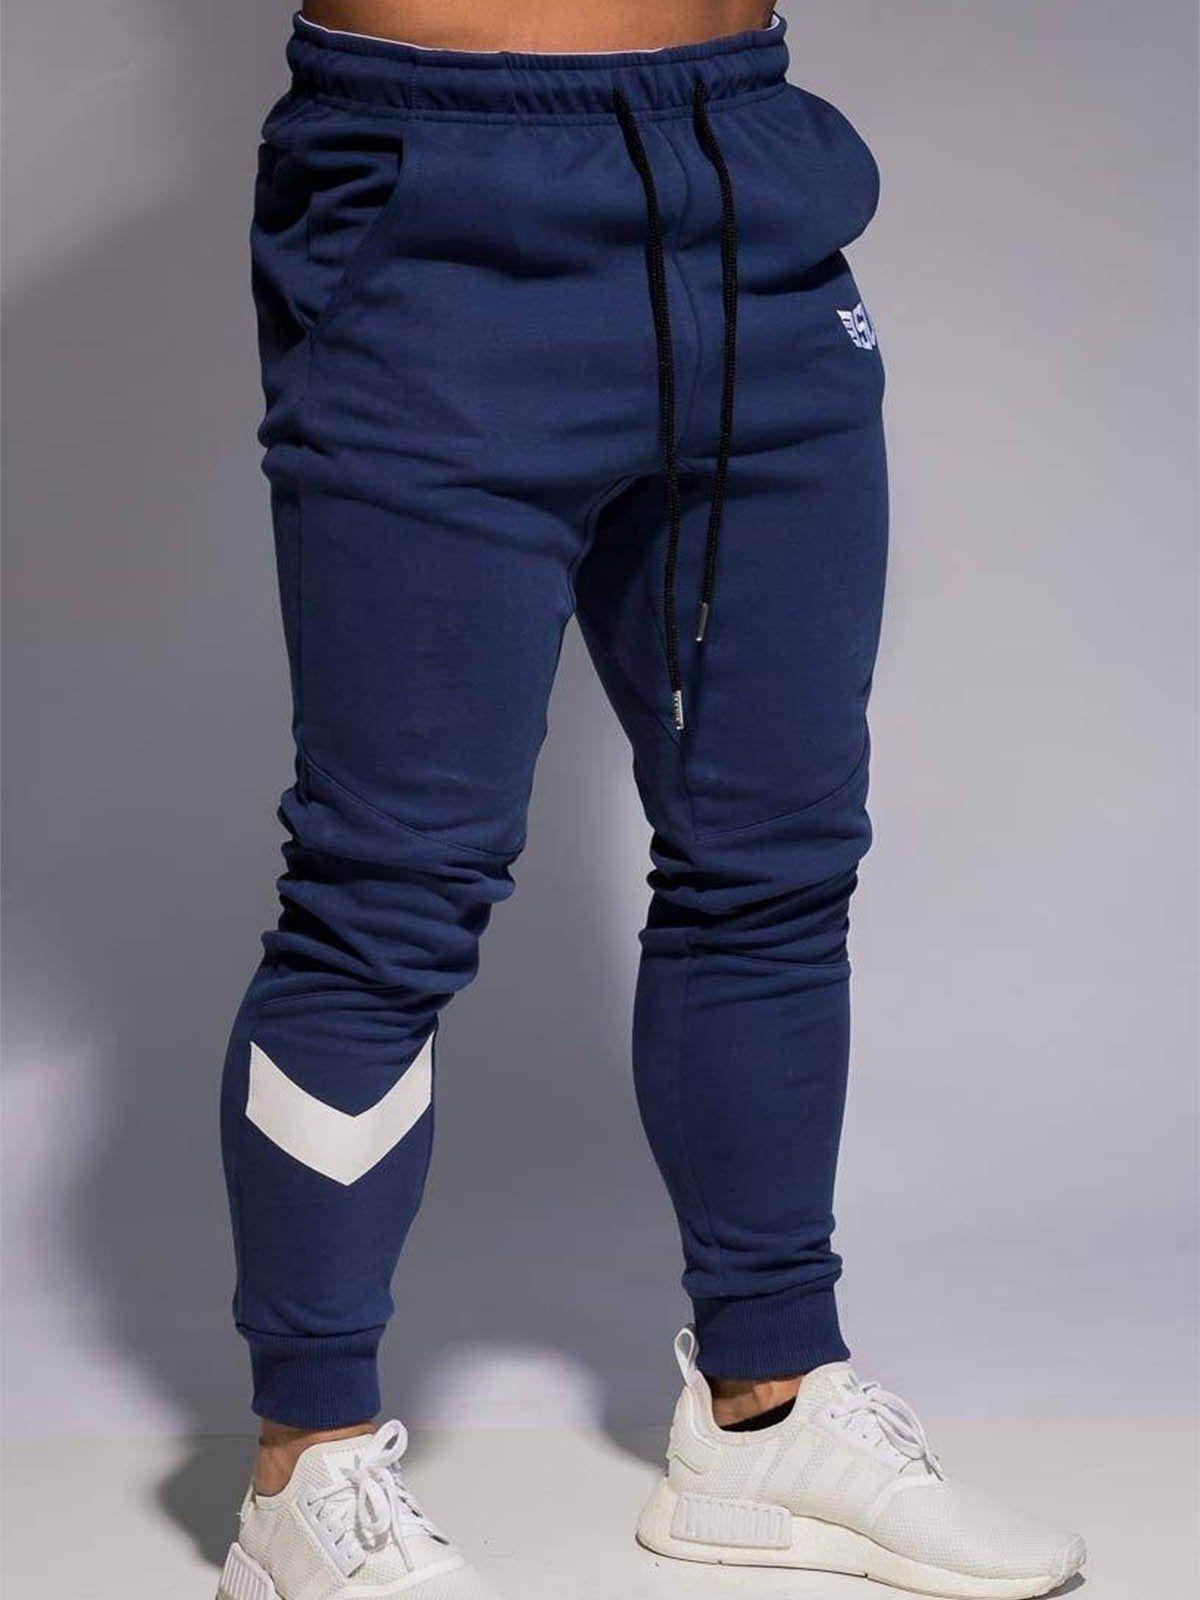 421164c6 Size Up Training Joggers - Blue Slugger Athletic Pants for Men - Size Up  Apparel